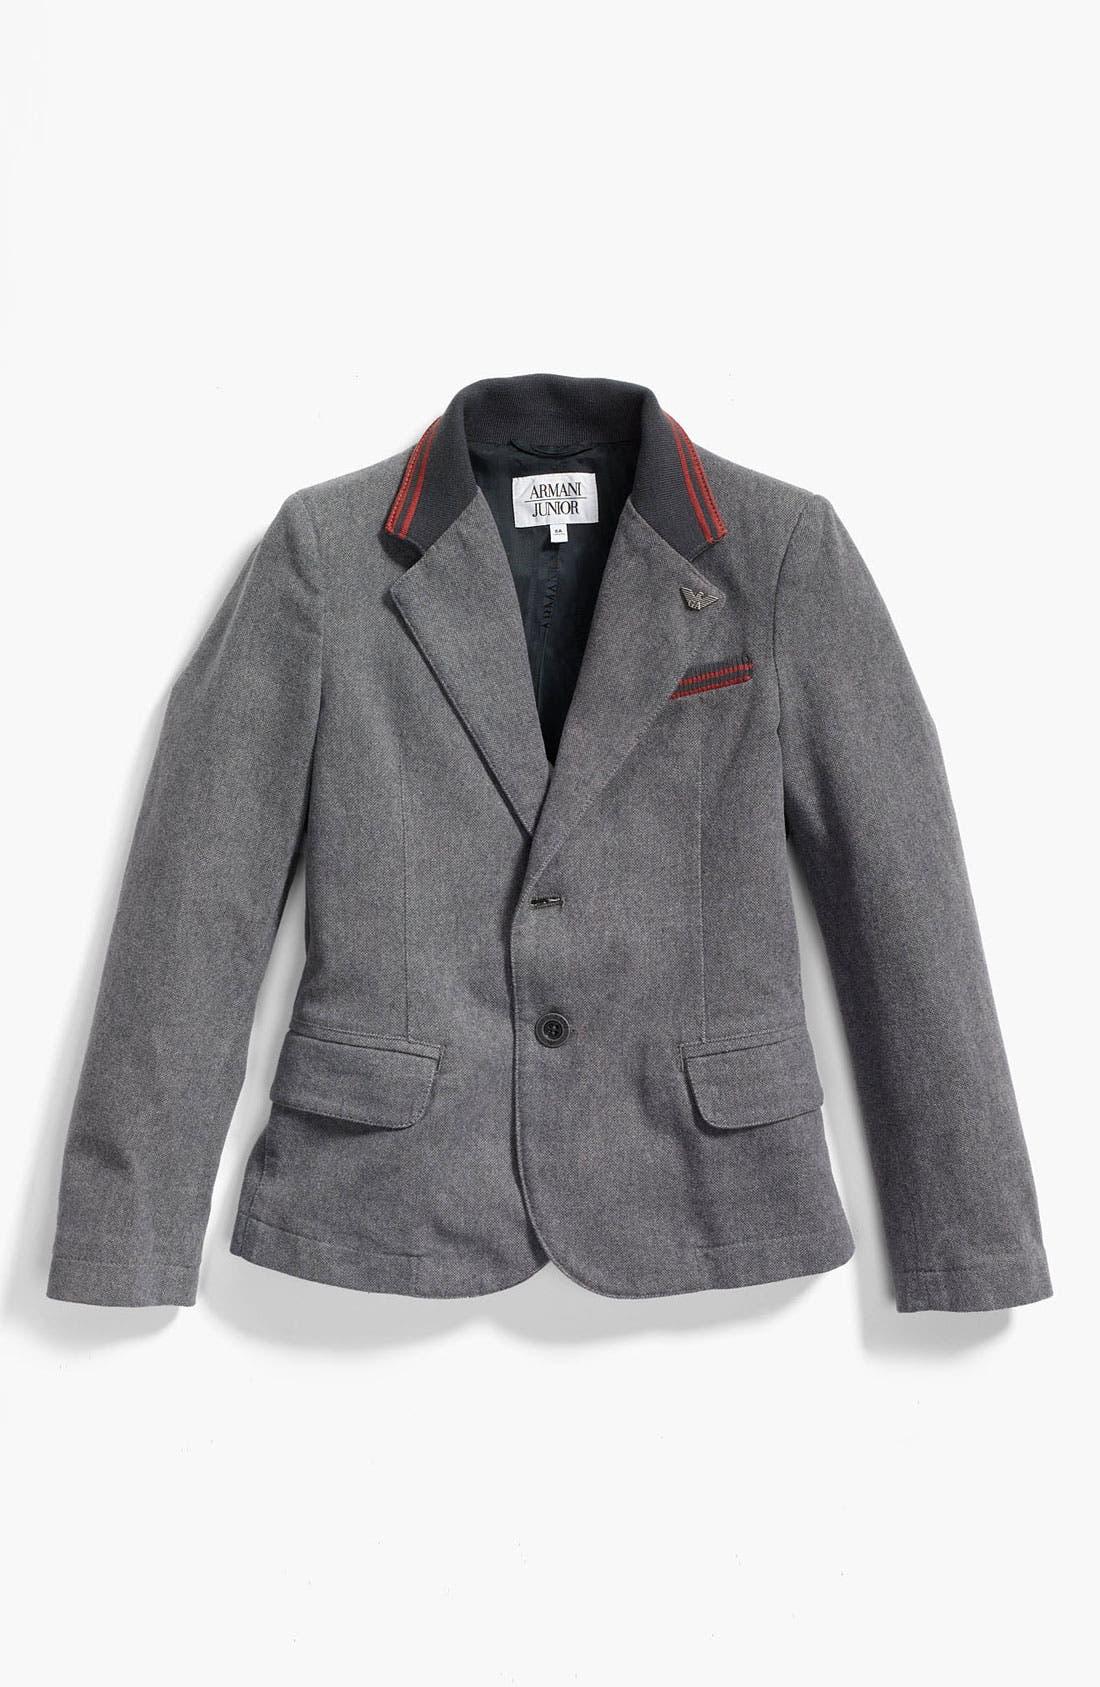 Alternate Image 1 Selected - Armani Junior Sportcoat (Big Boys)